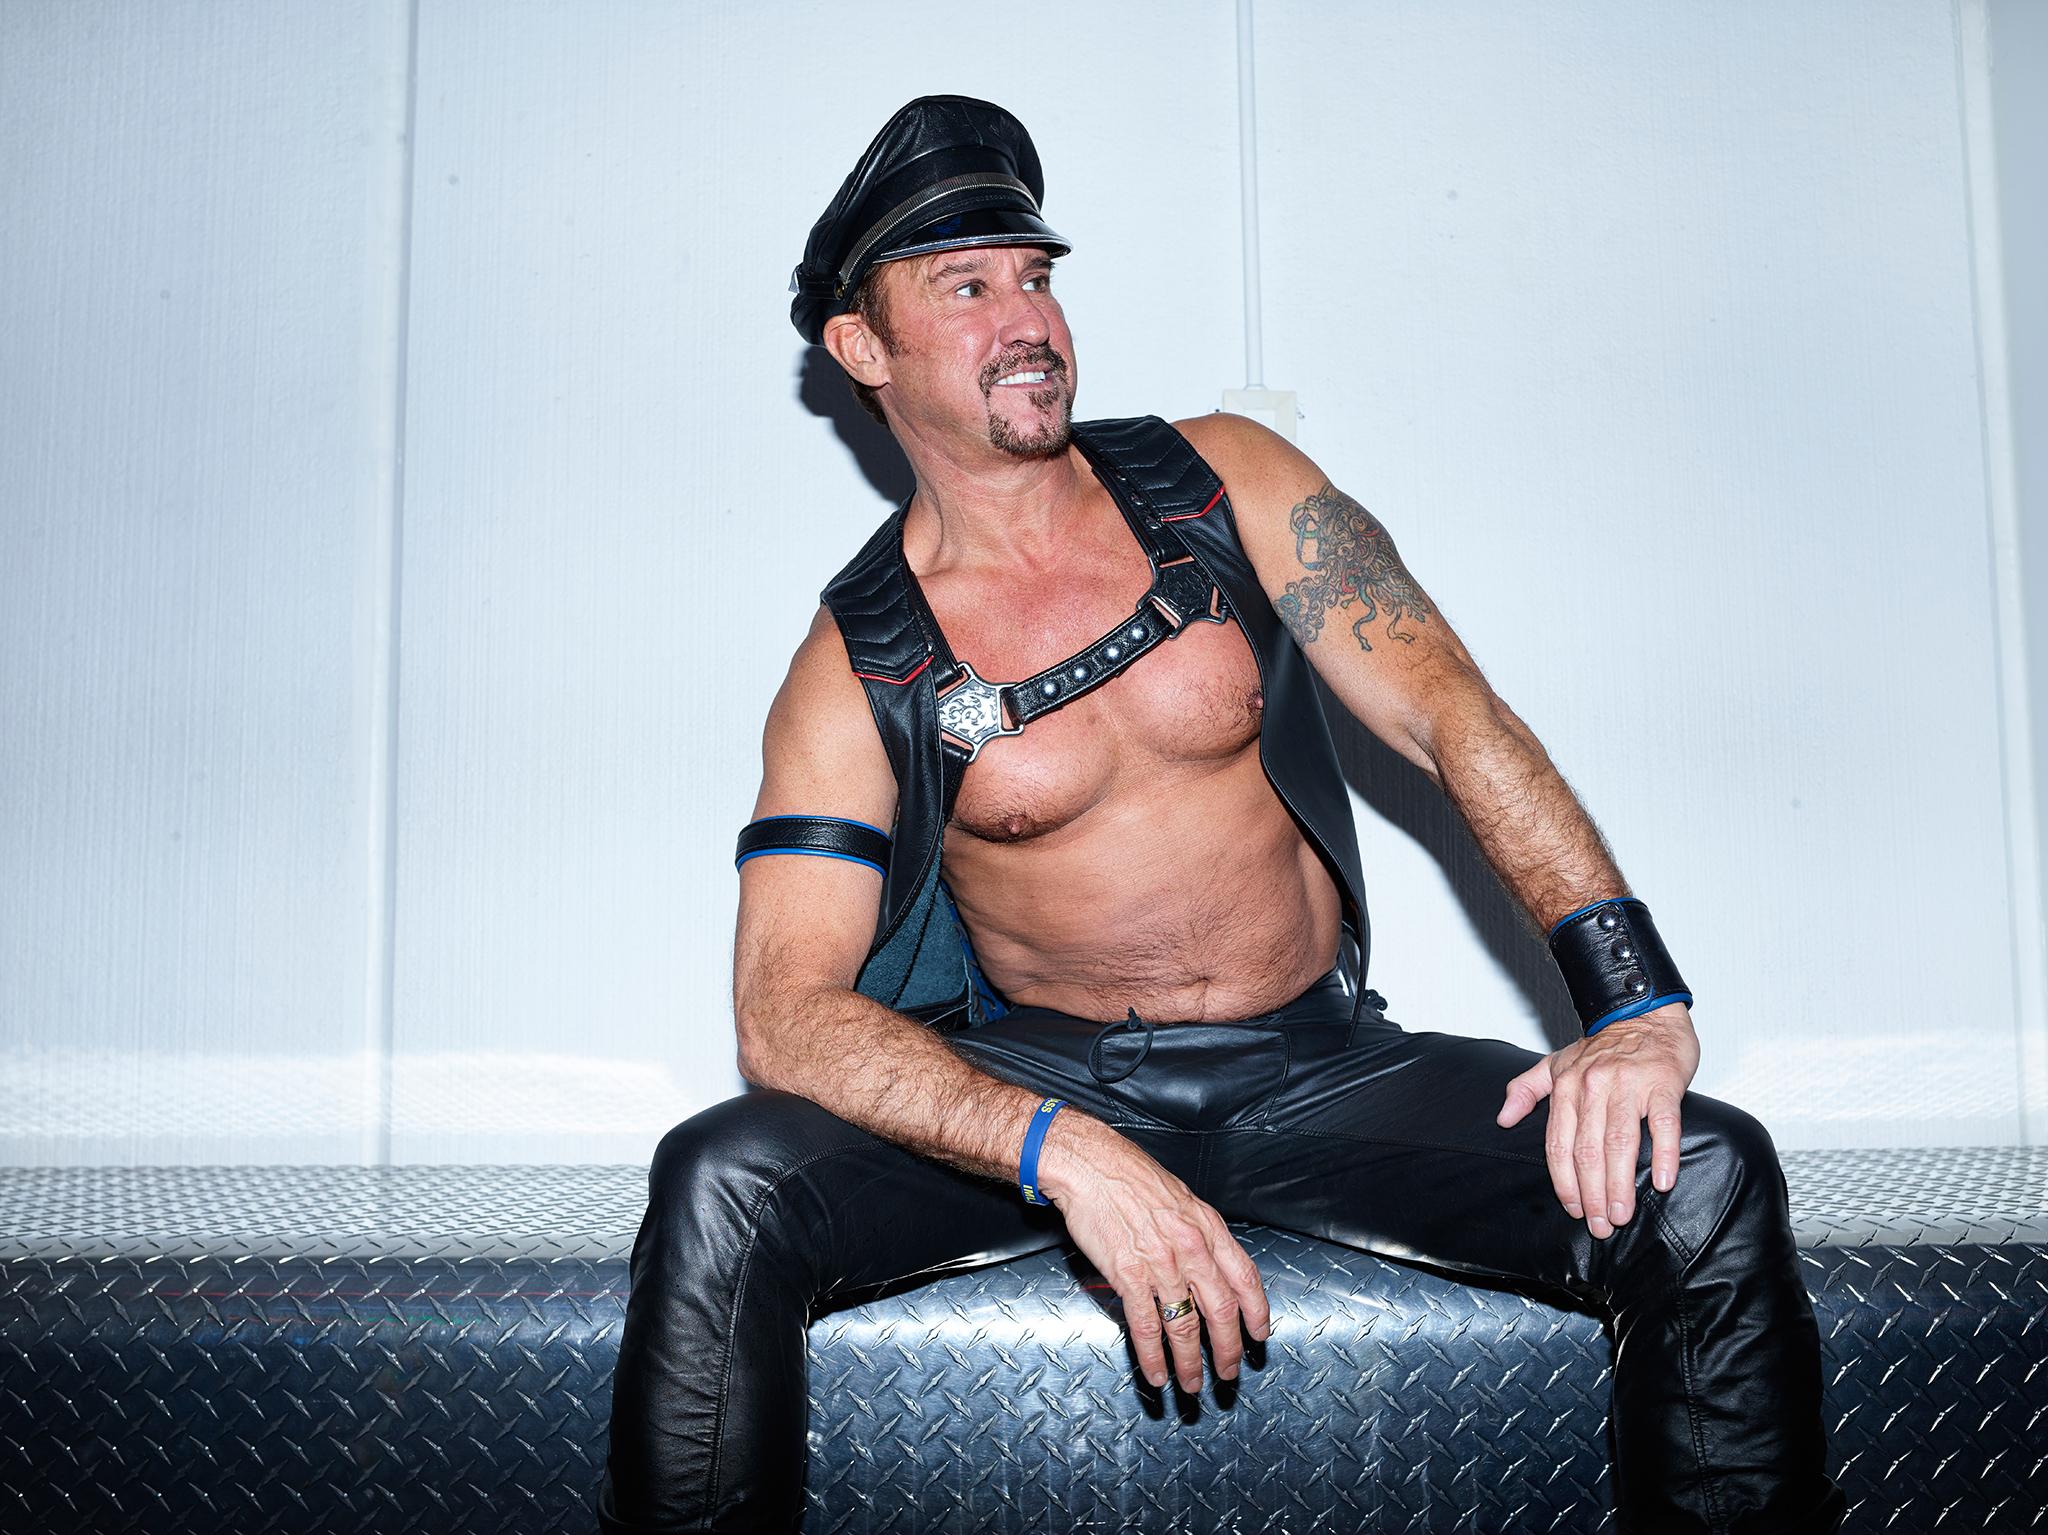 International Mr. Leather Weekend